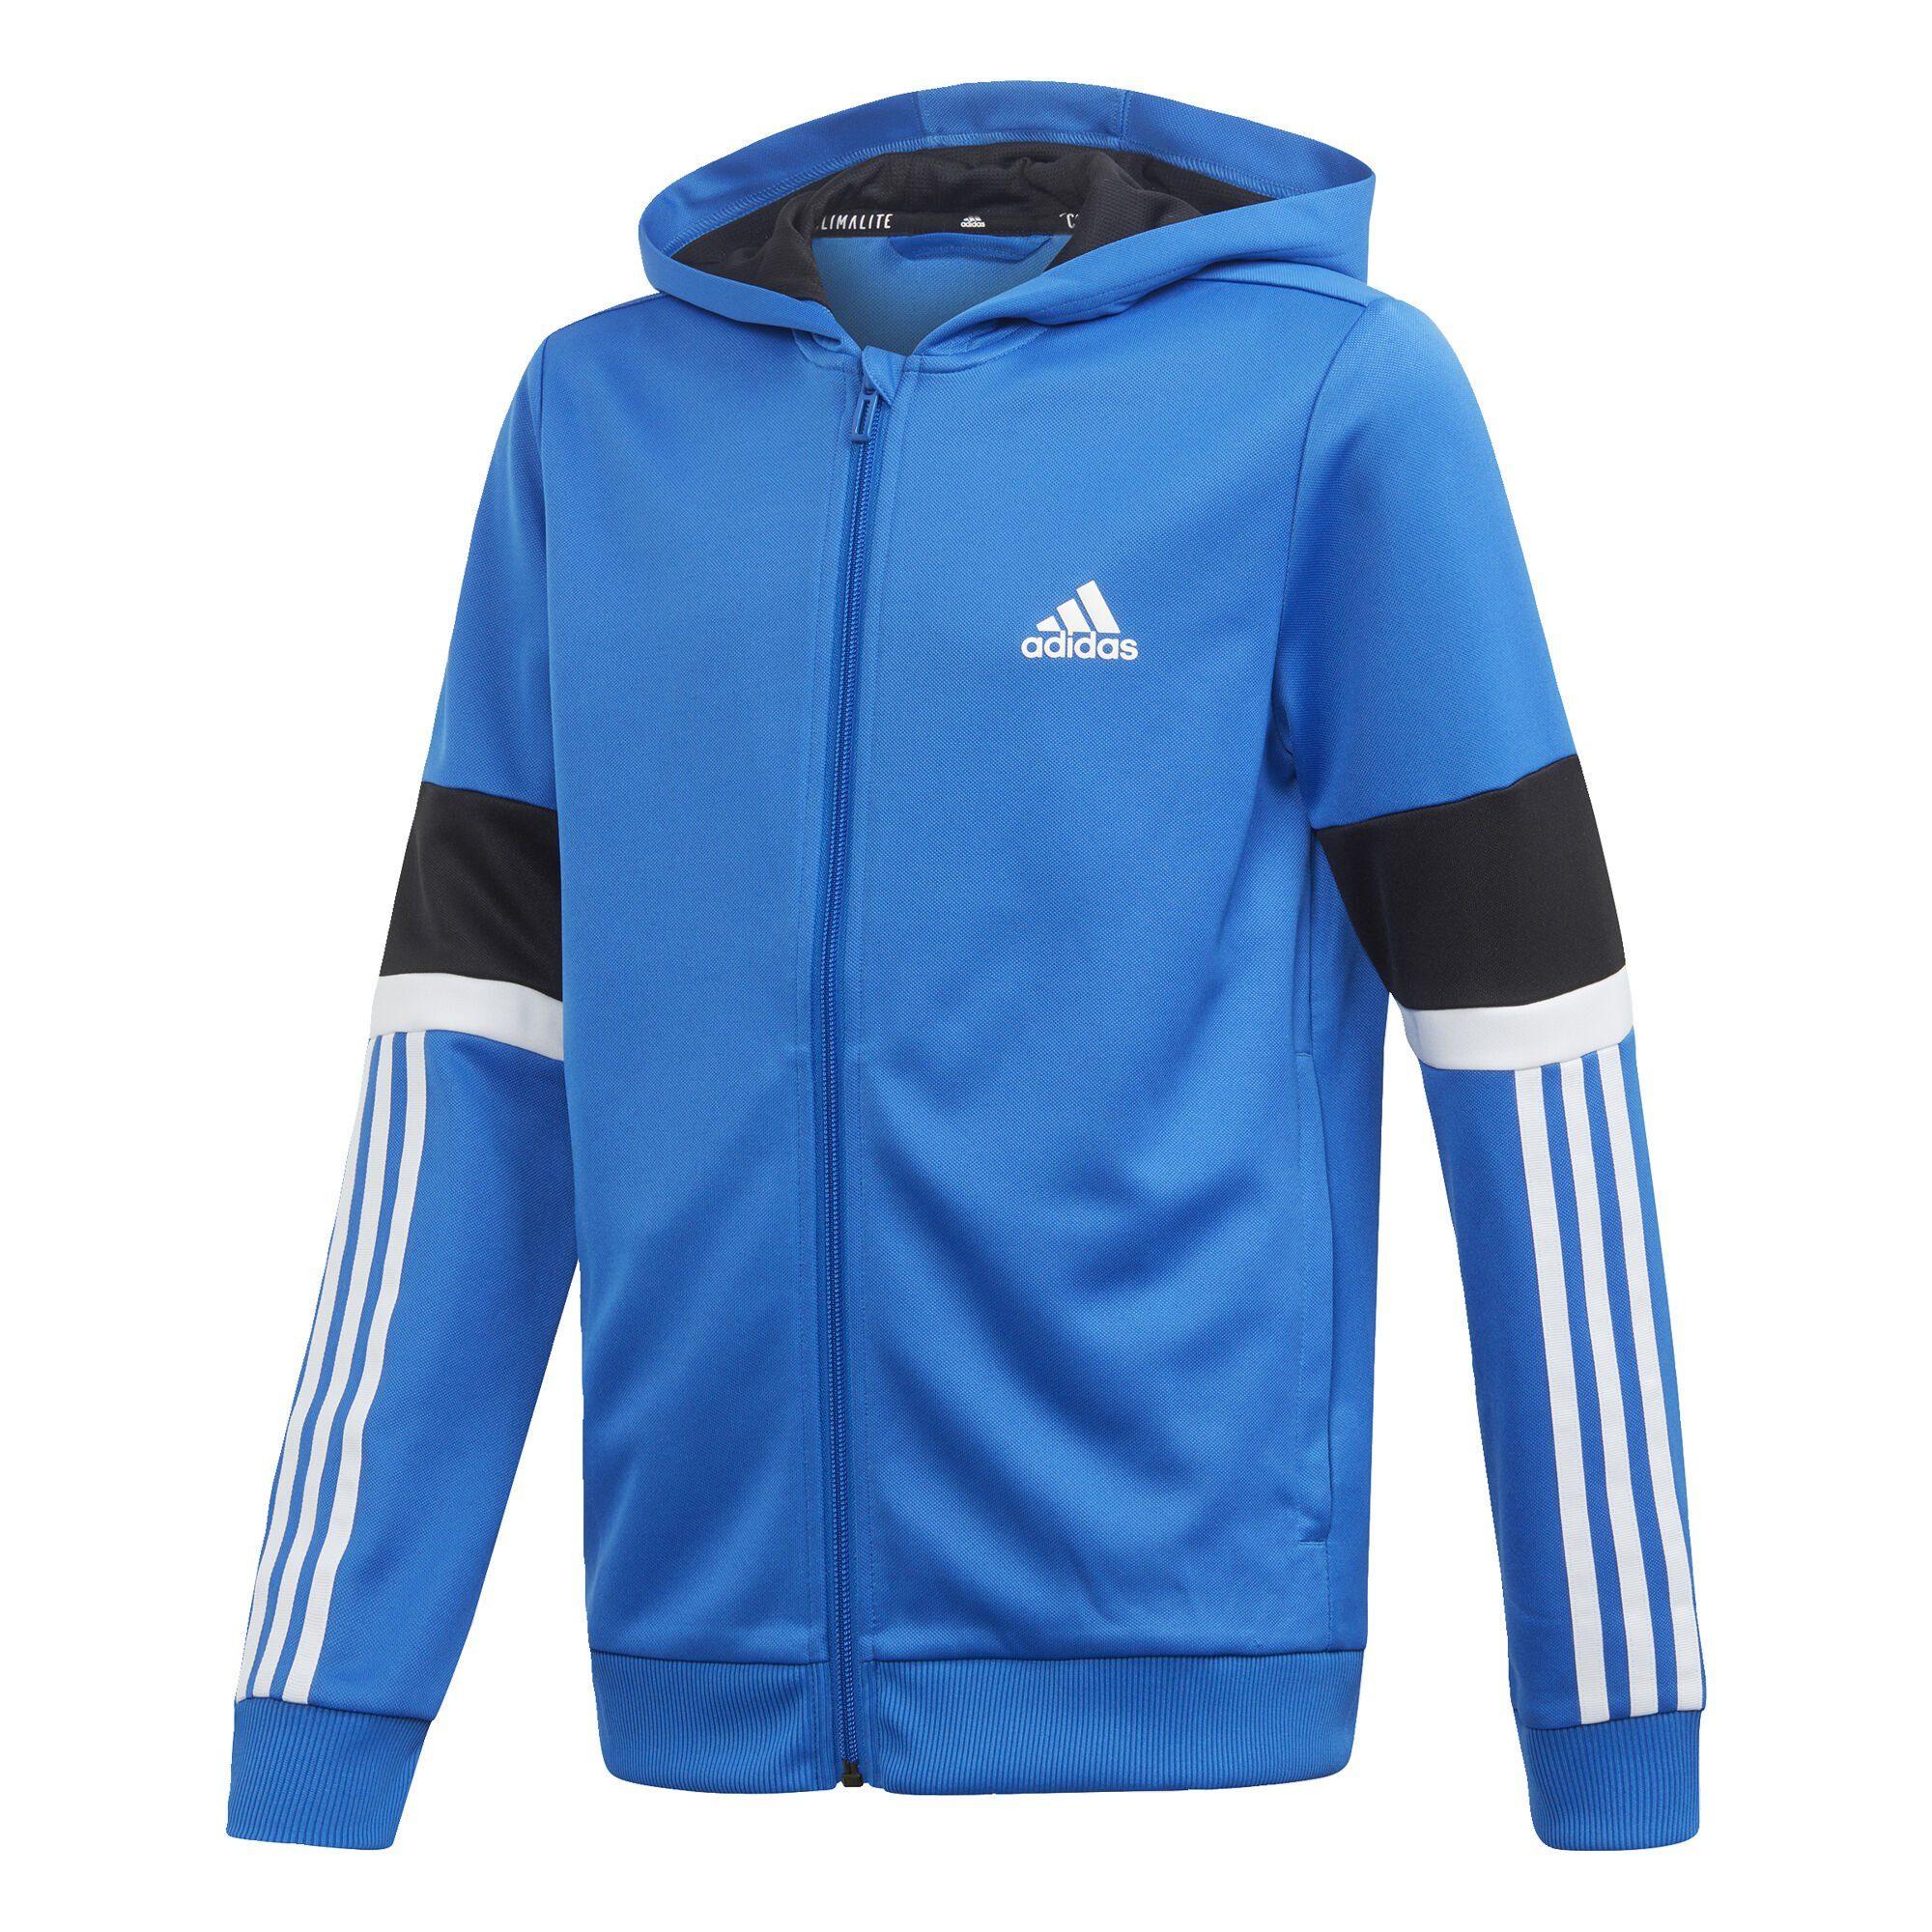 adidas Performance Sweatjacke »Equipment Kapuzenjacke« Clima online kaufen | OTTO